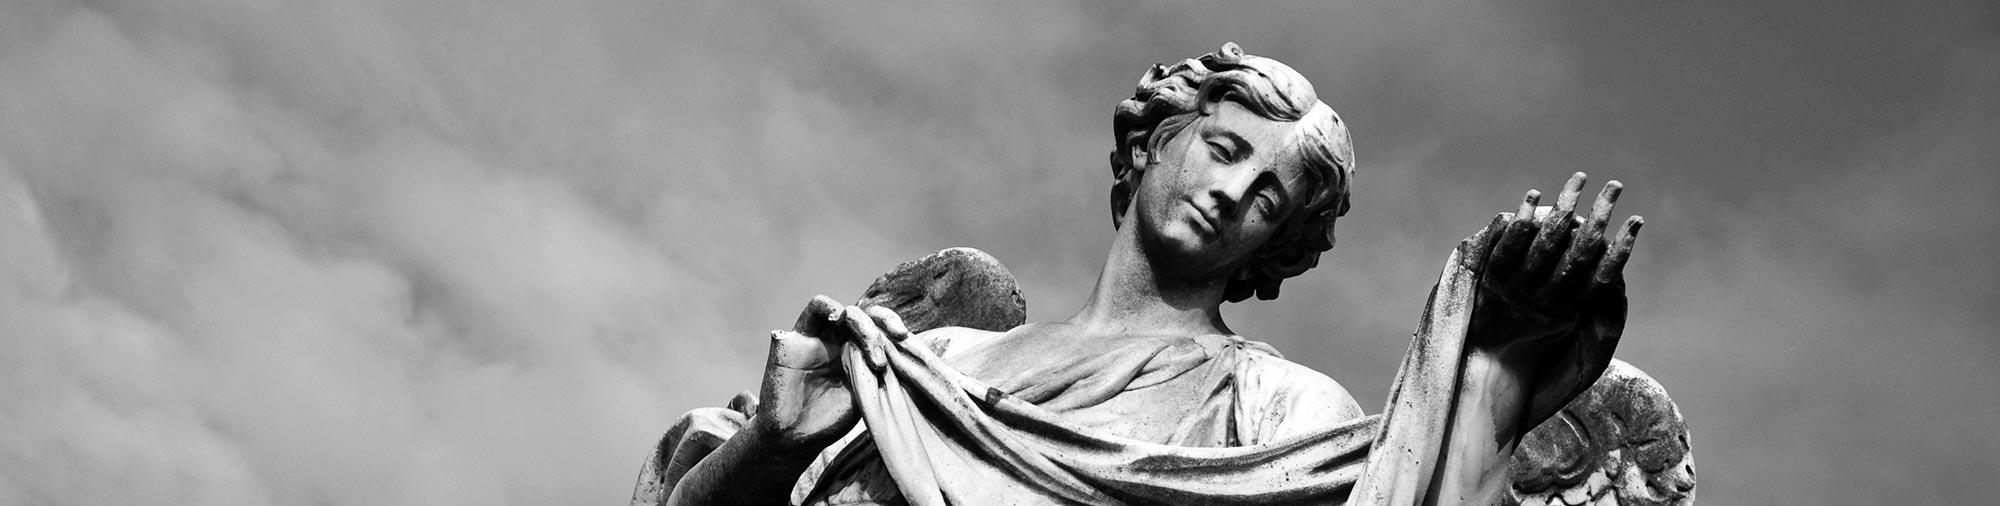 Pompe Funebri Lorenzetti – Funerale Alvaro Eusepi